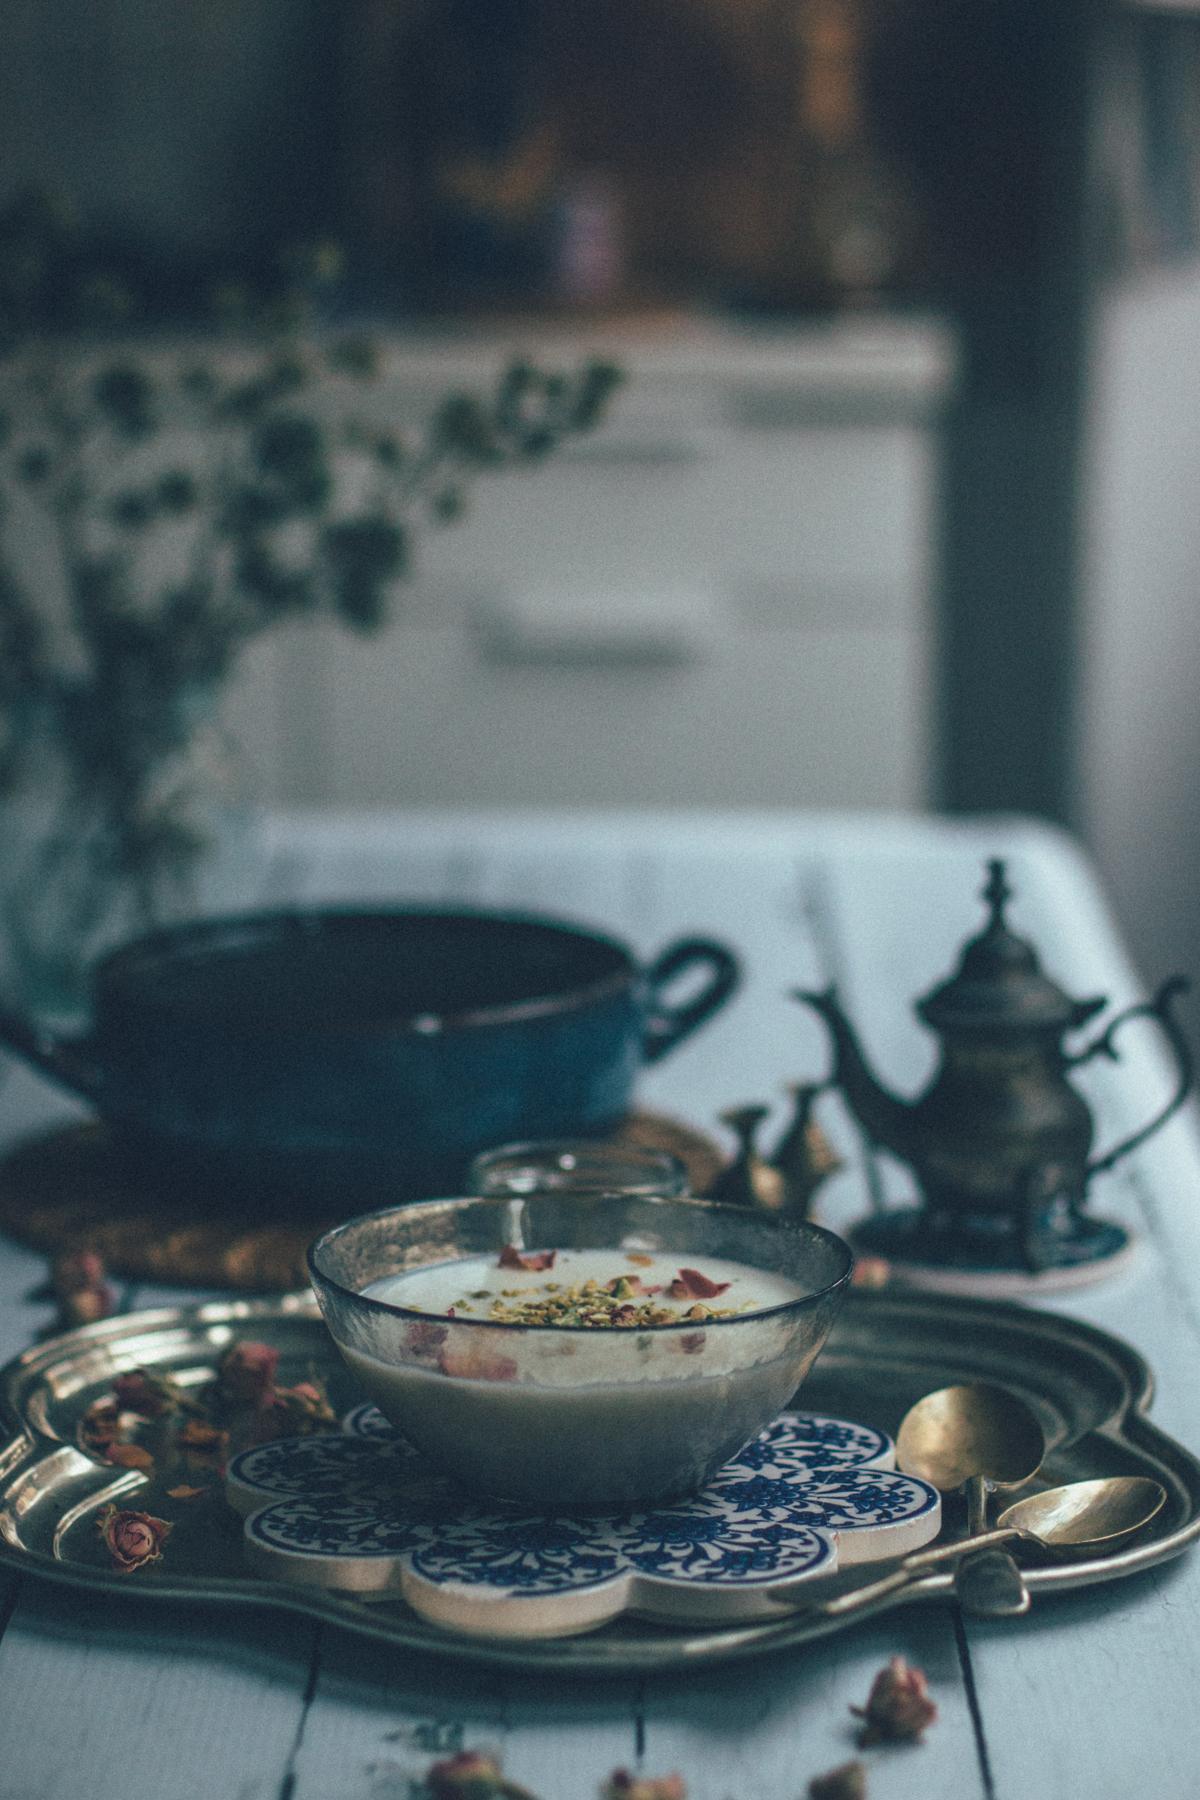 Persian Kheer Recipe (Firni) | Budino Dolce di Riso (Kheer) alla Persiana | Lab Noon